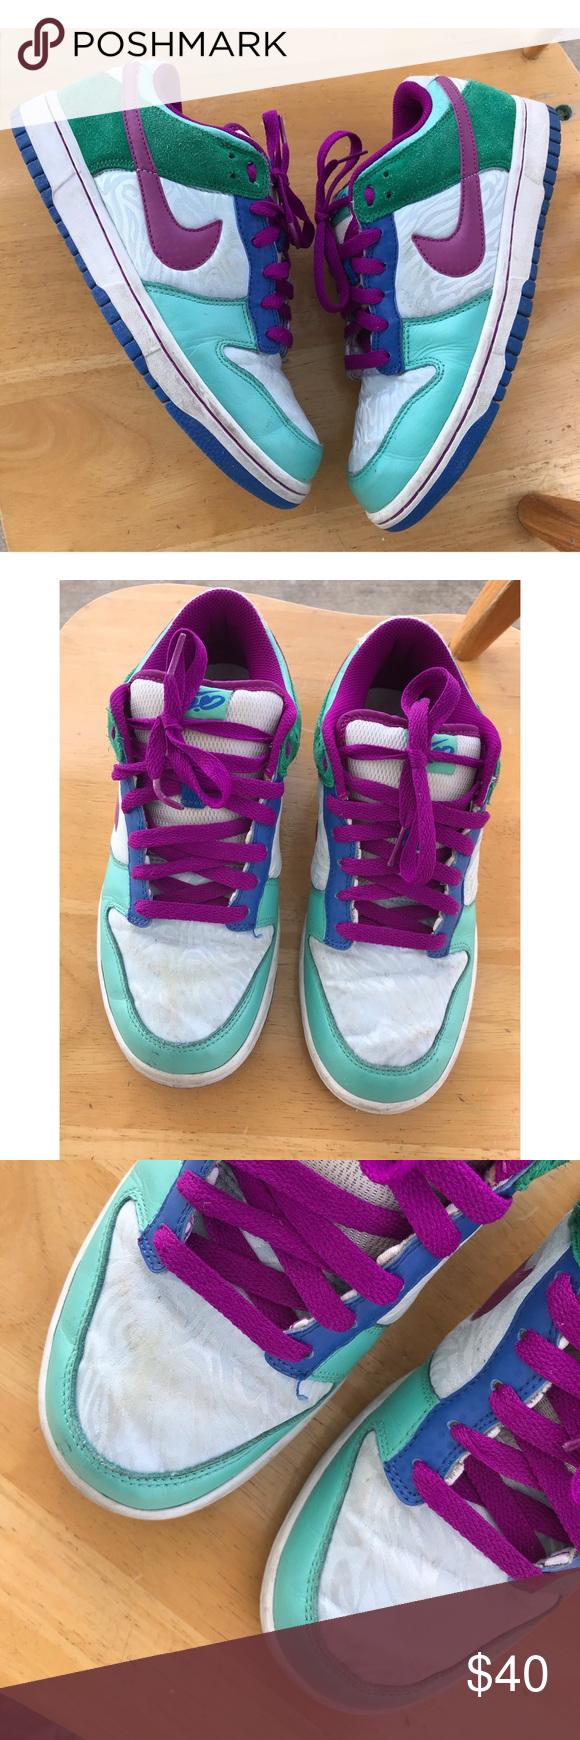 Manga Transición azafata  Nike SB 6.0 Low Dunk Shoes Women's 8.5 Vintage Nike SB 6.0 Low Dunks from  2009 Green, Purple , Blue & Silver Zebra Print Goo…   Women shoes, Vintage  nike, Nike sb